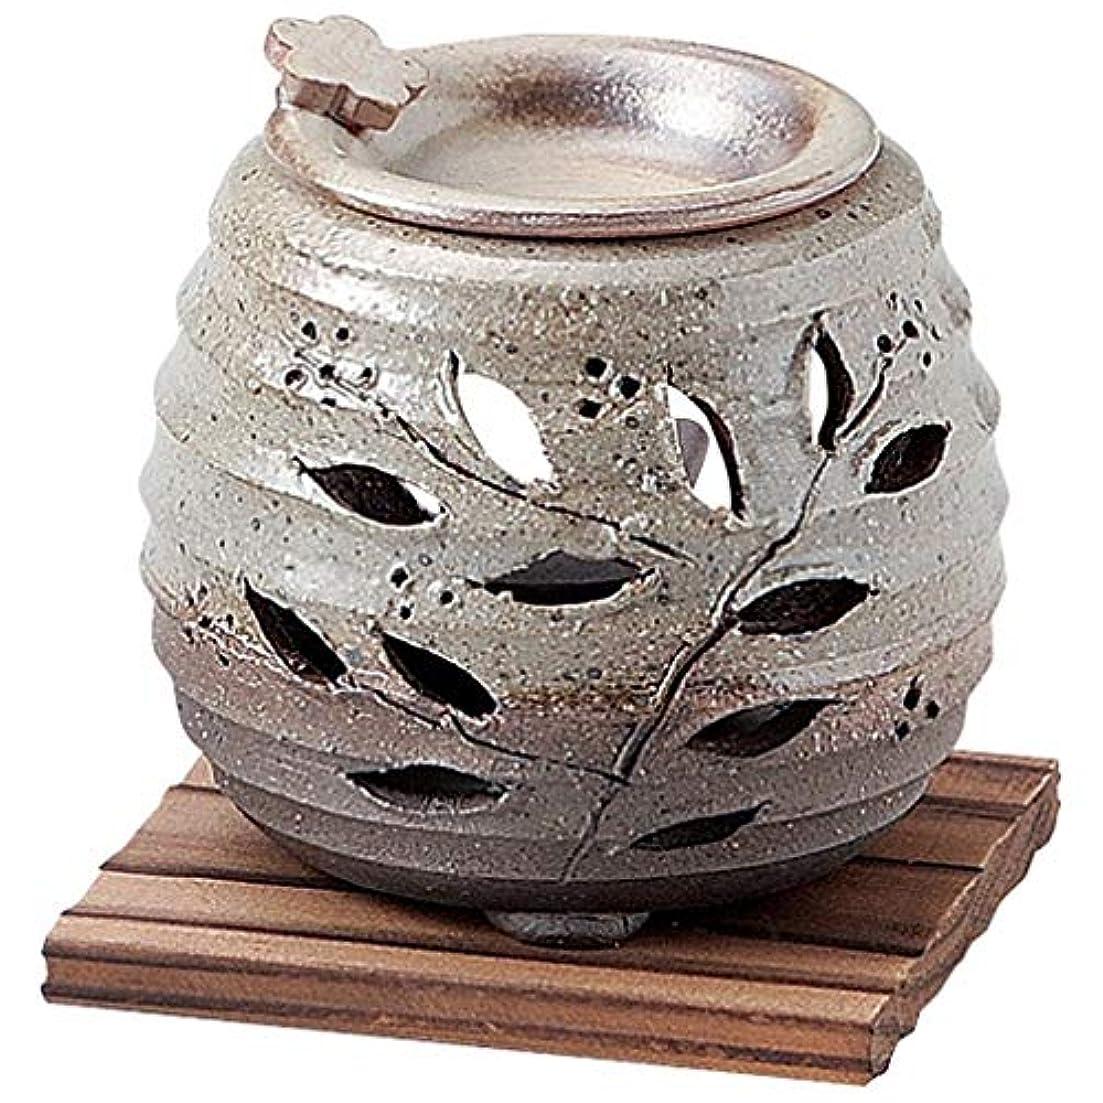 平和戦争聖人YI--Y-1619 常滑焼 茶香炉 径11×高さ10.5cm